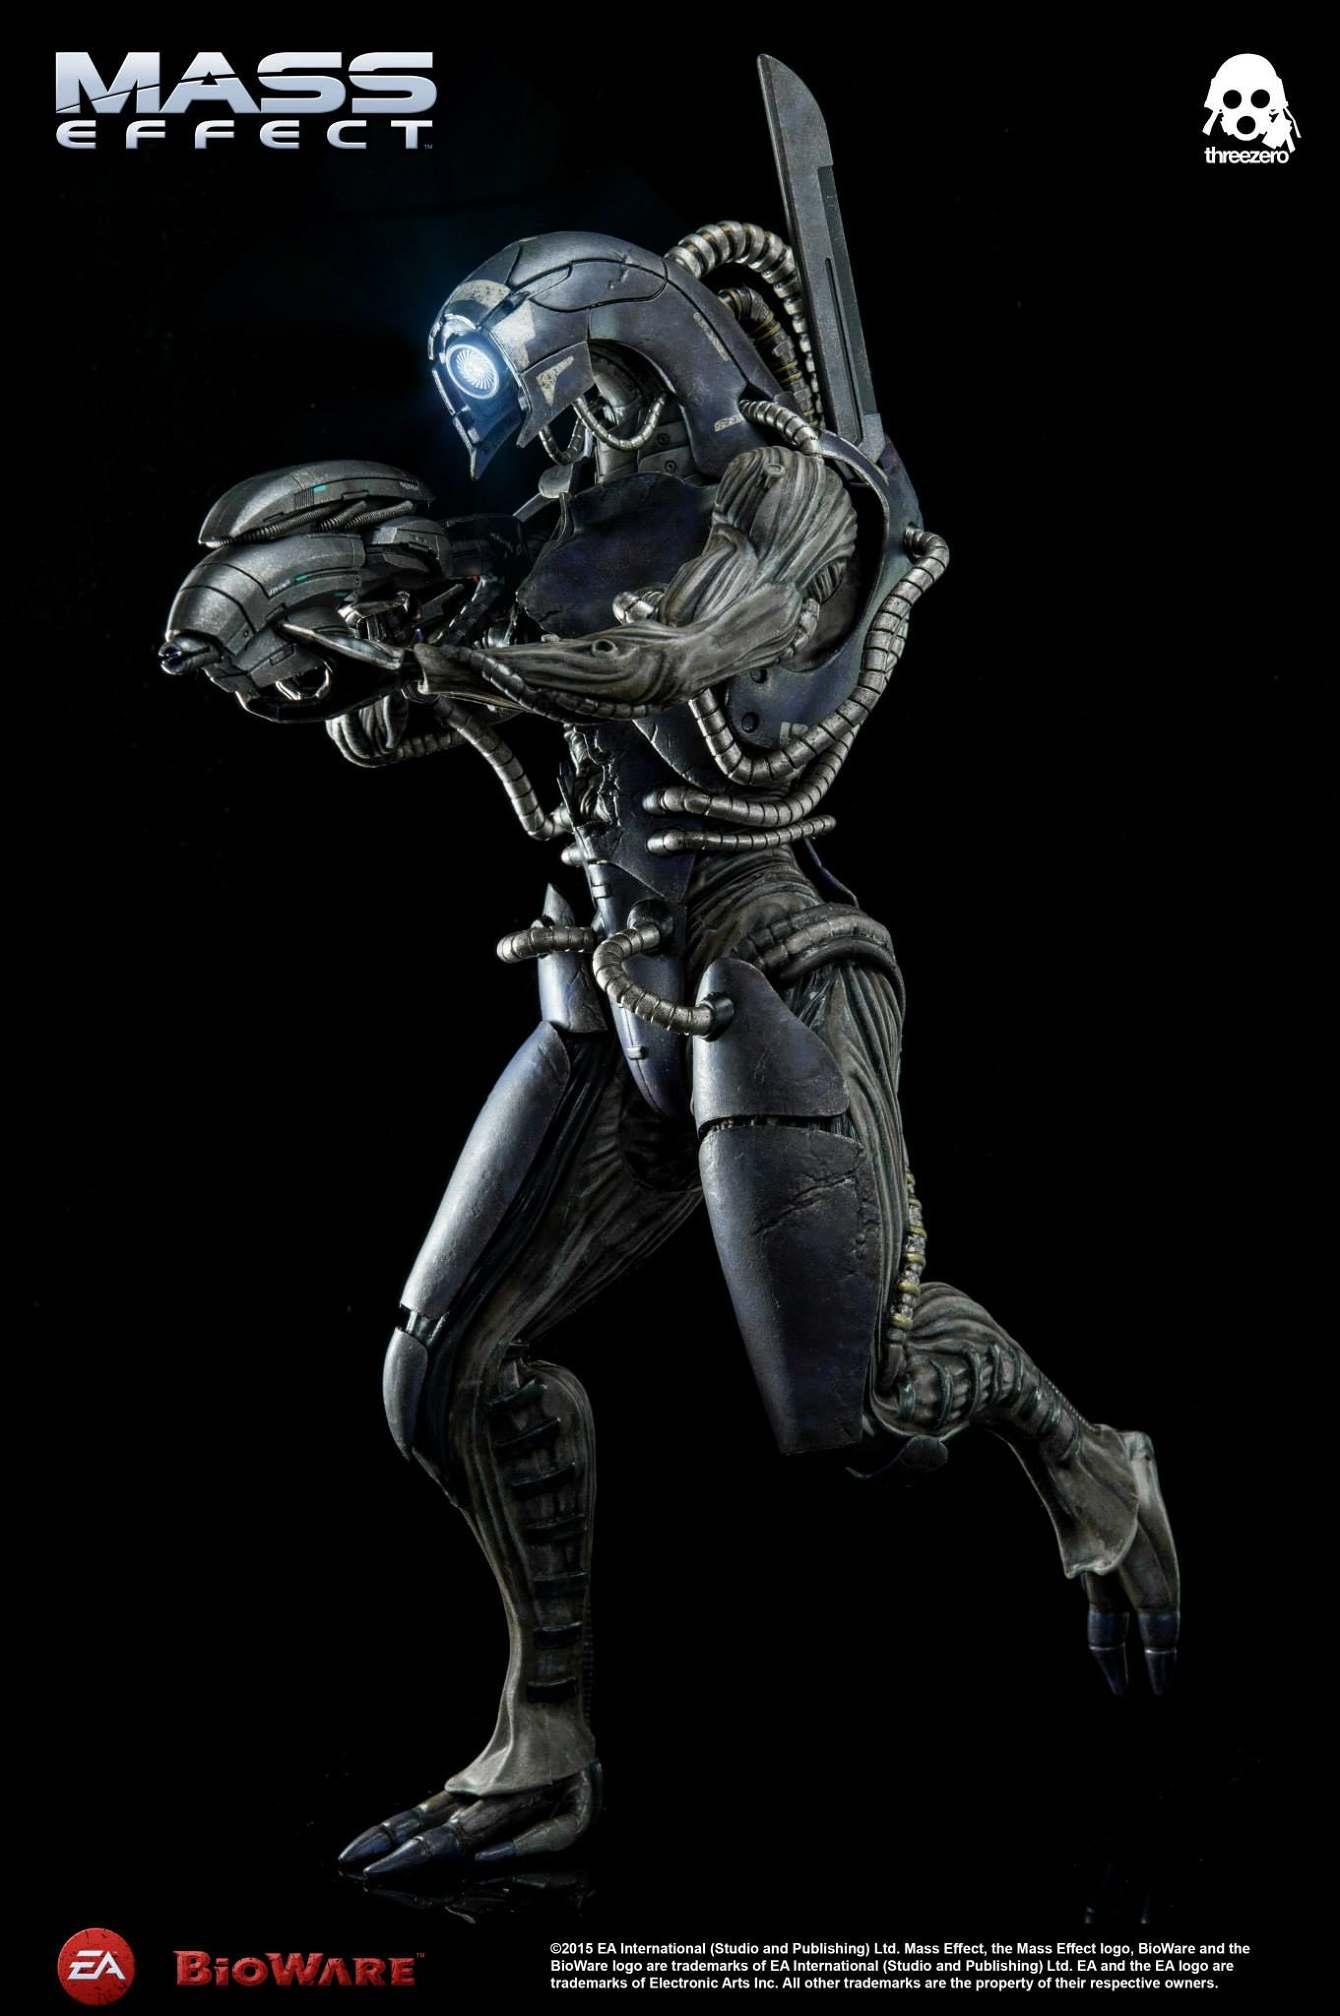 ThreeZero-Bioware-video-game-Legion-Mass-Effect-figure-17_1340_c.jpg